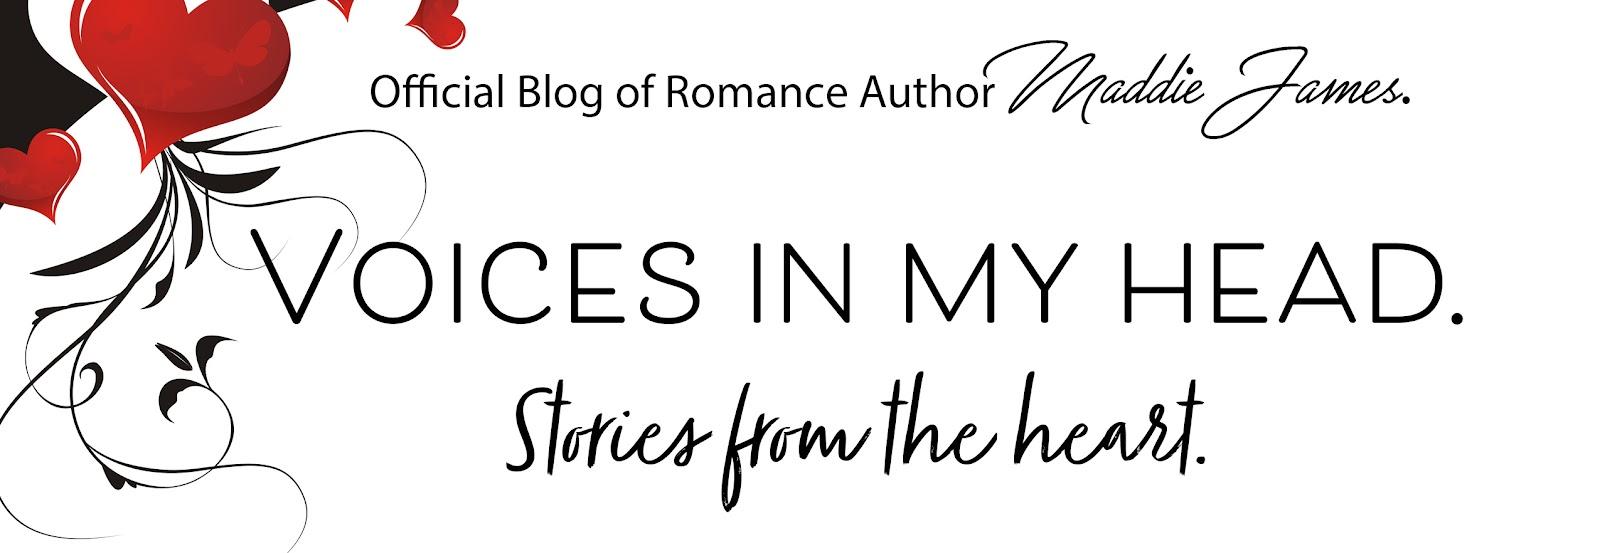 Maddie James, Author Blog